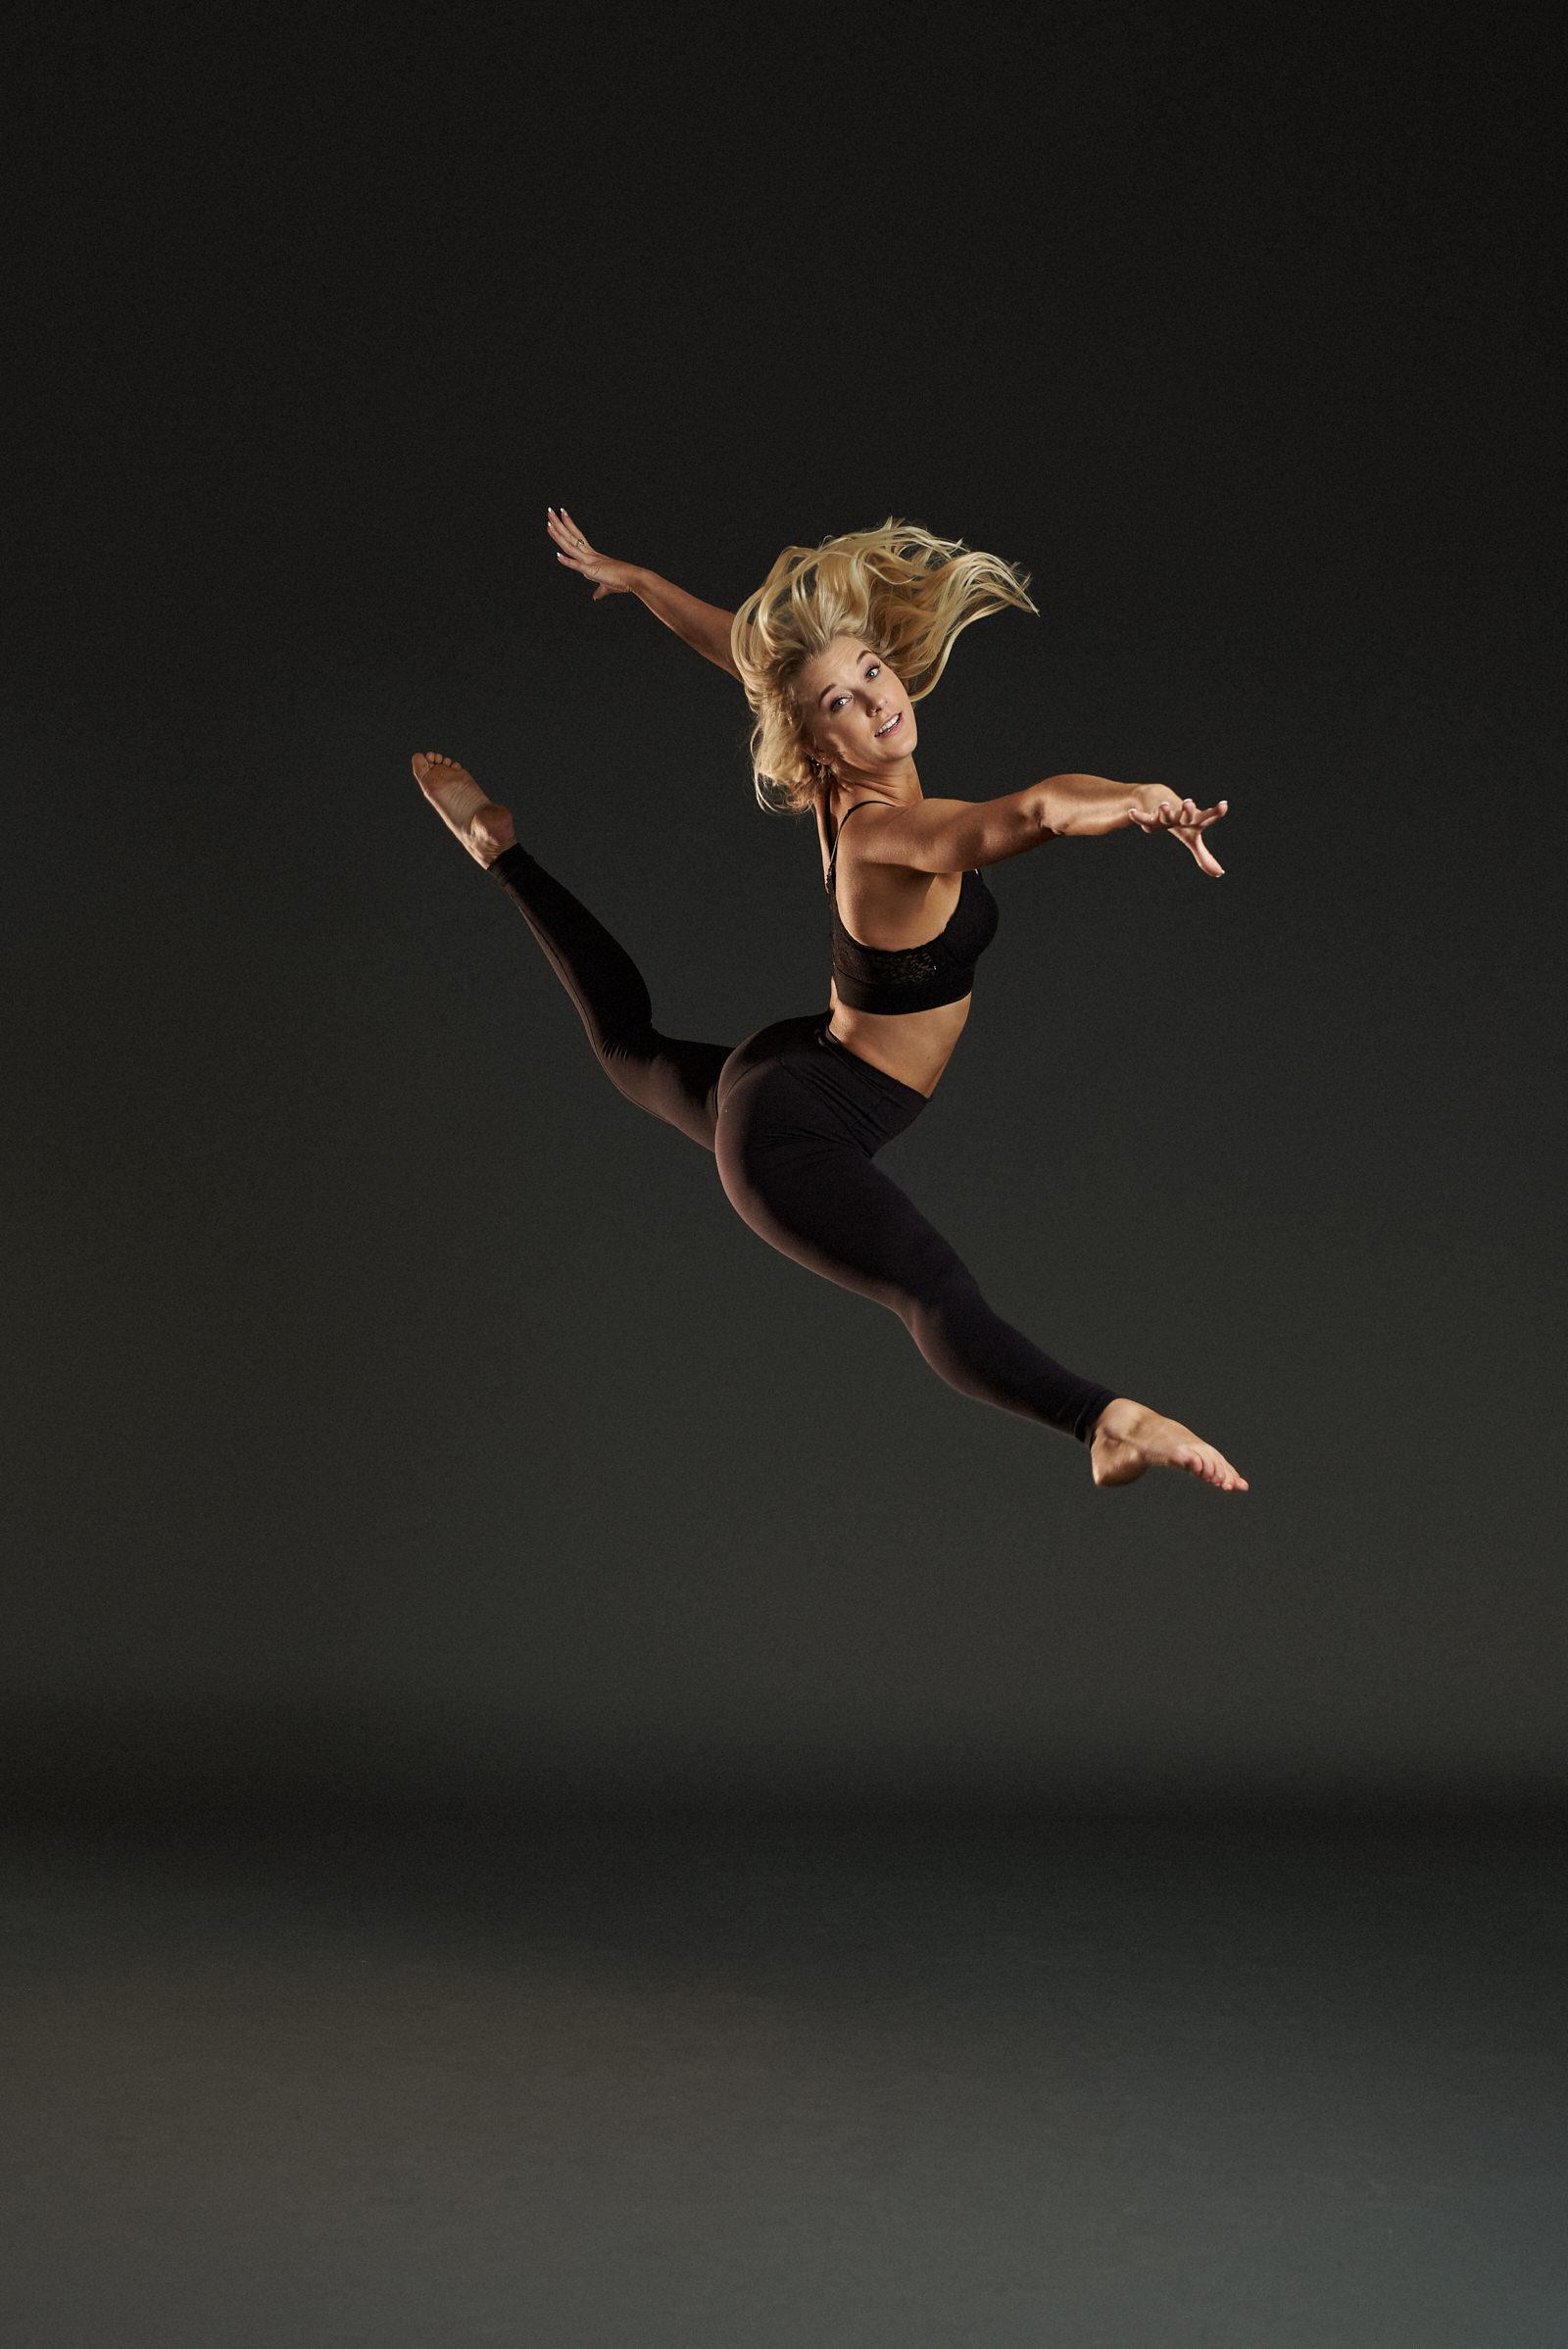 dance-photographer-marcus-roy-hoffman-8.jpg